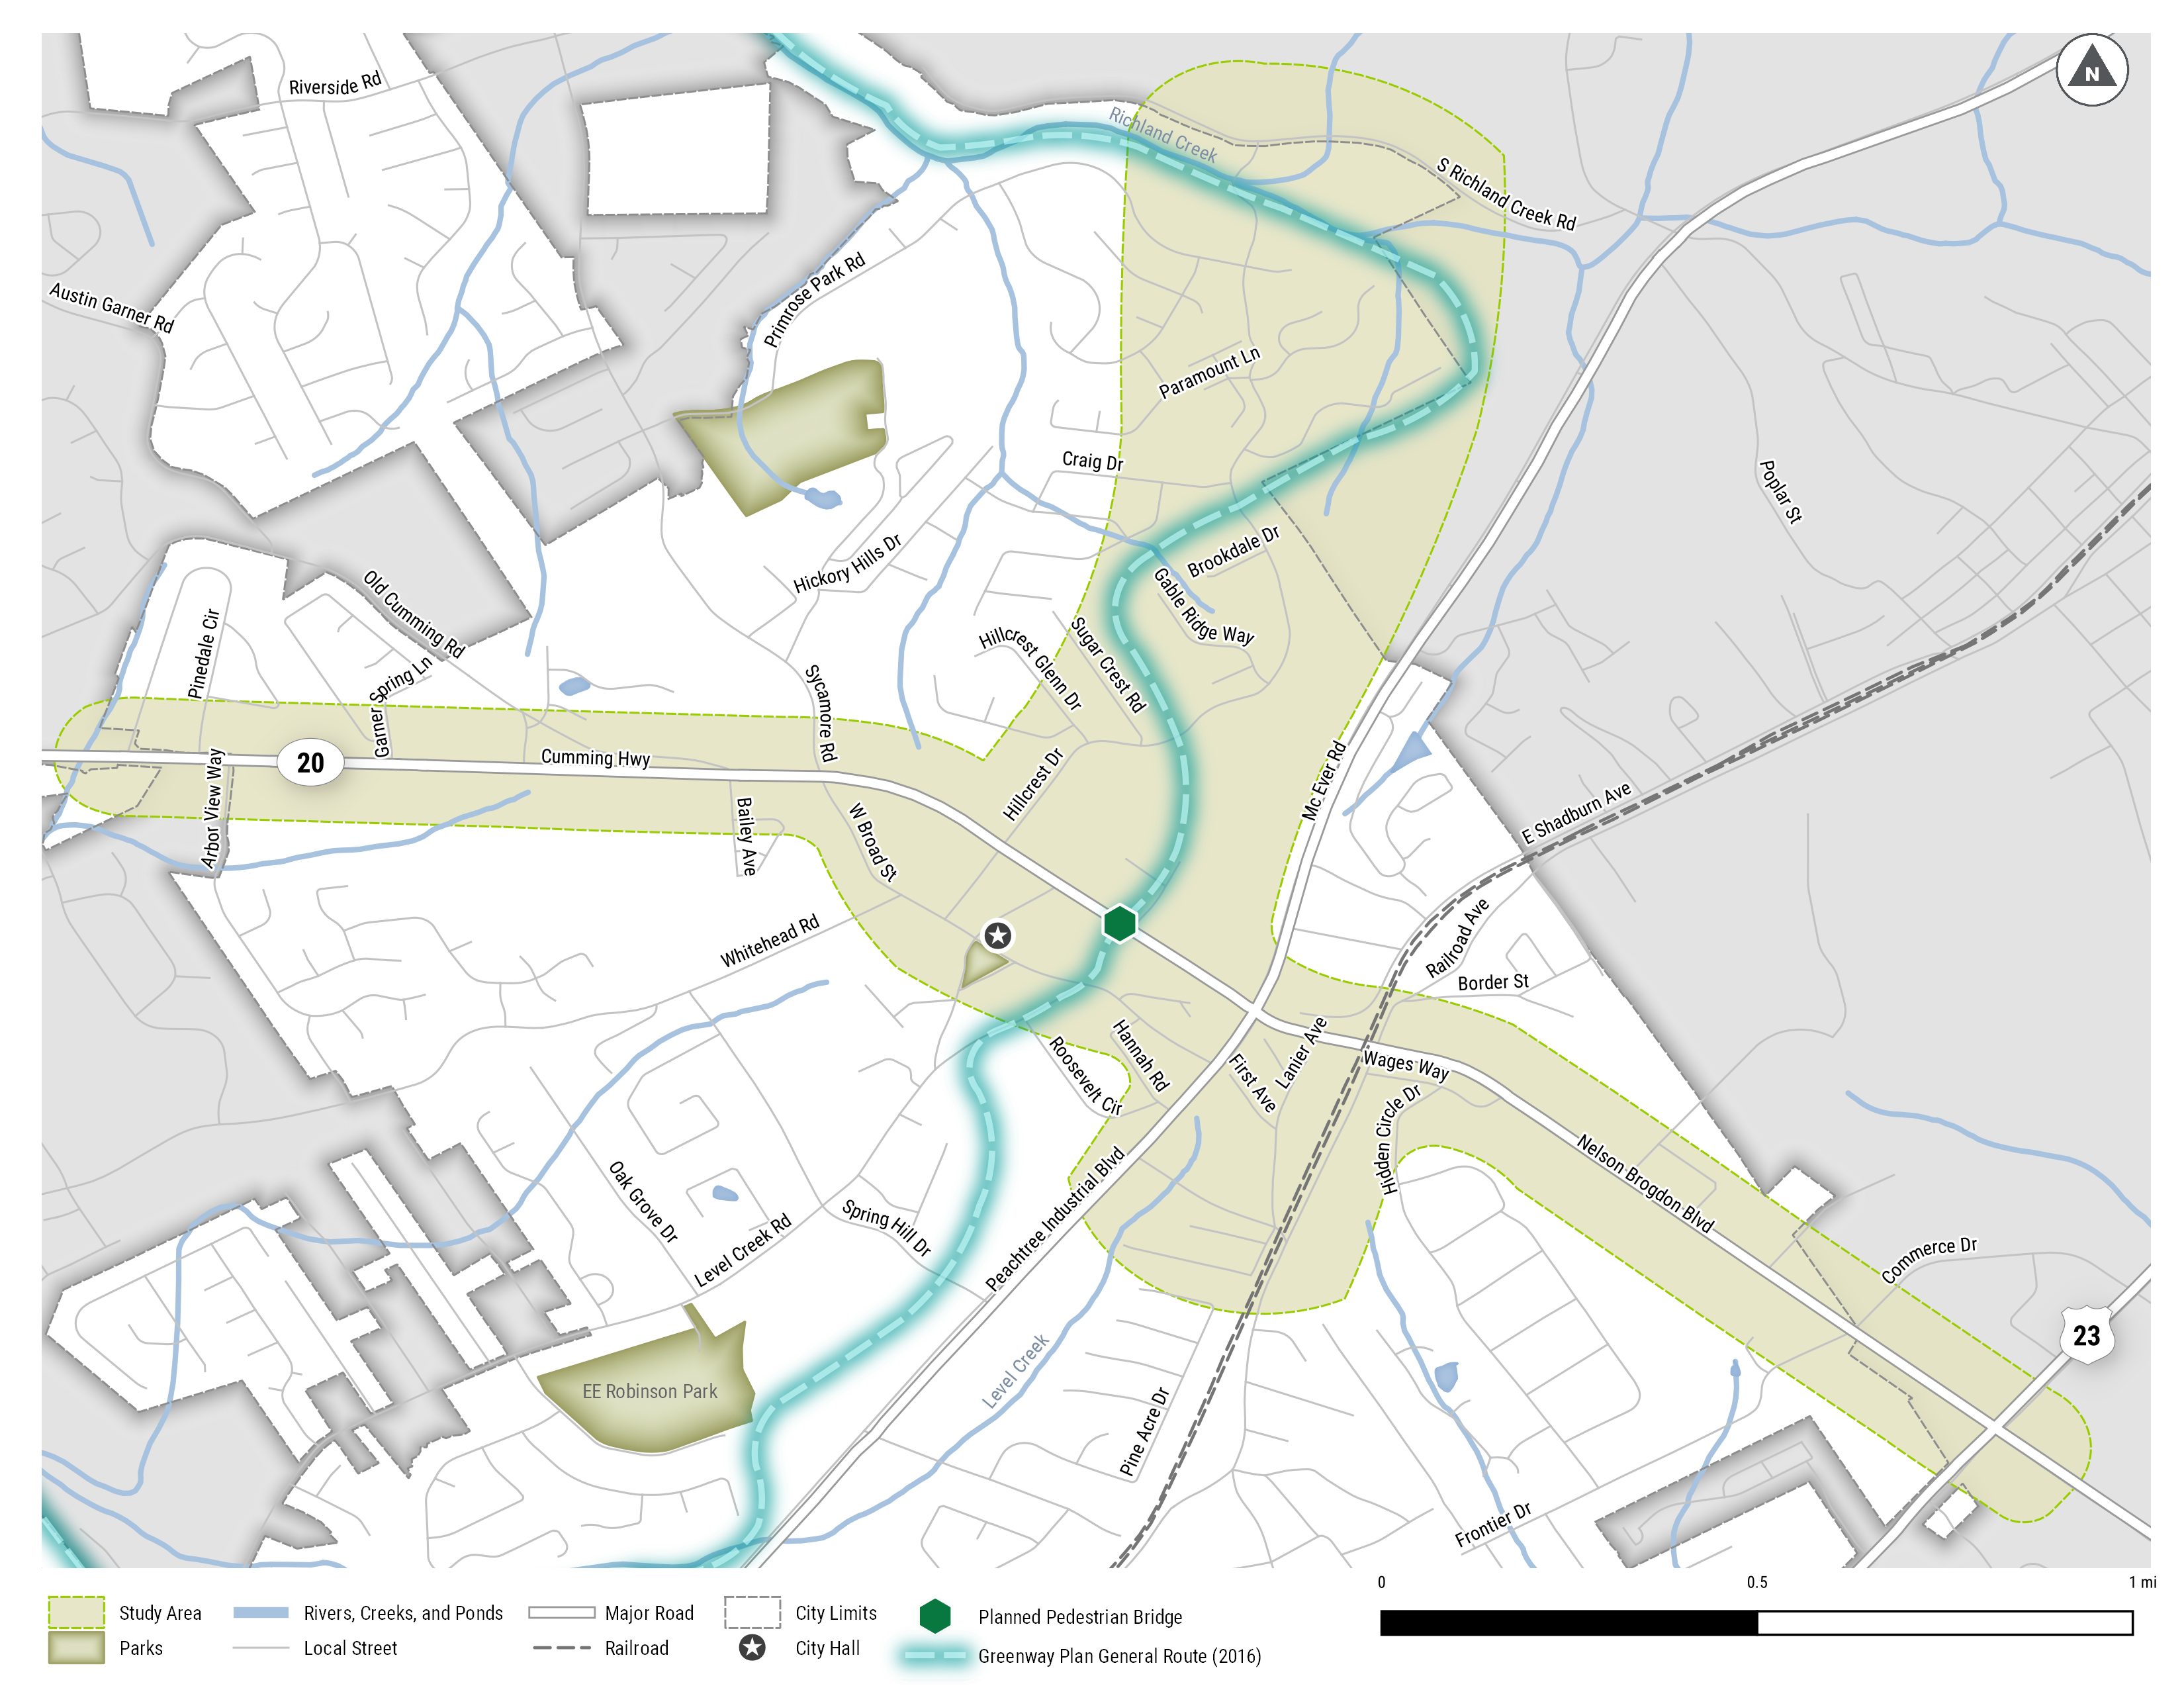 map of 2020 LCI study area